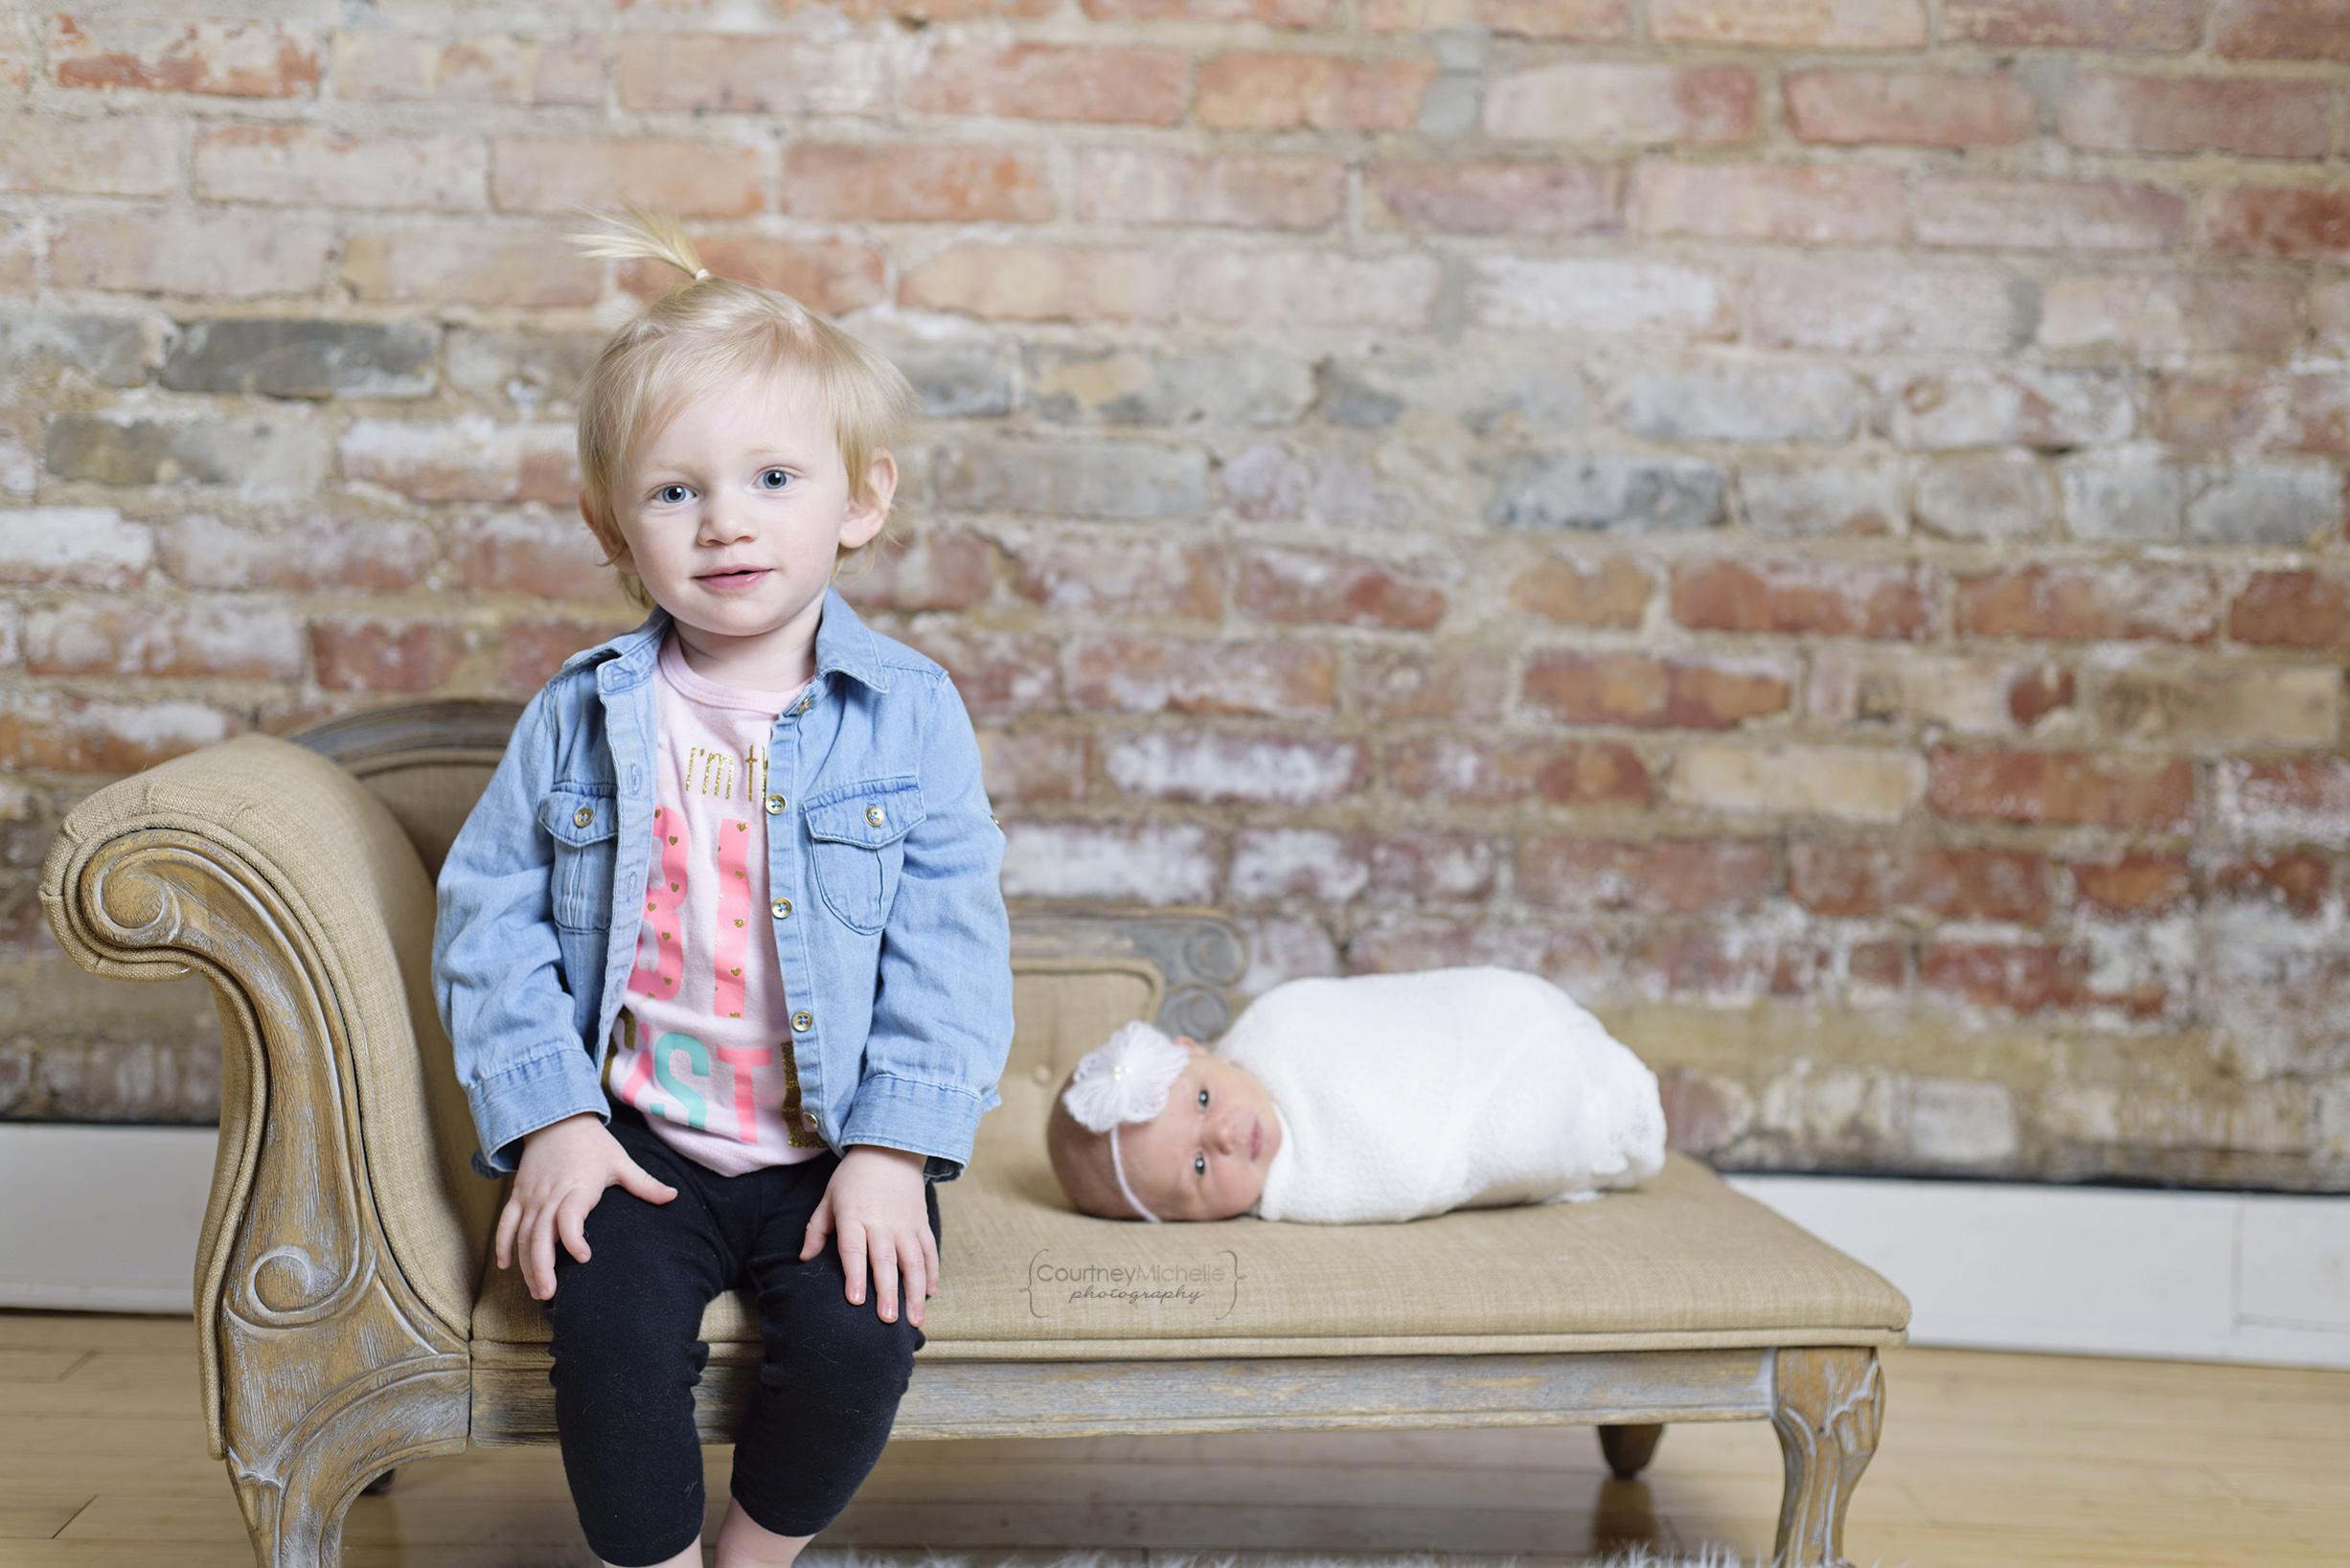 chicago-newborn-photographer-big-sister-and-baby©COPYRIGHTCMP-5143edit.jpg